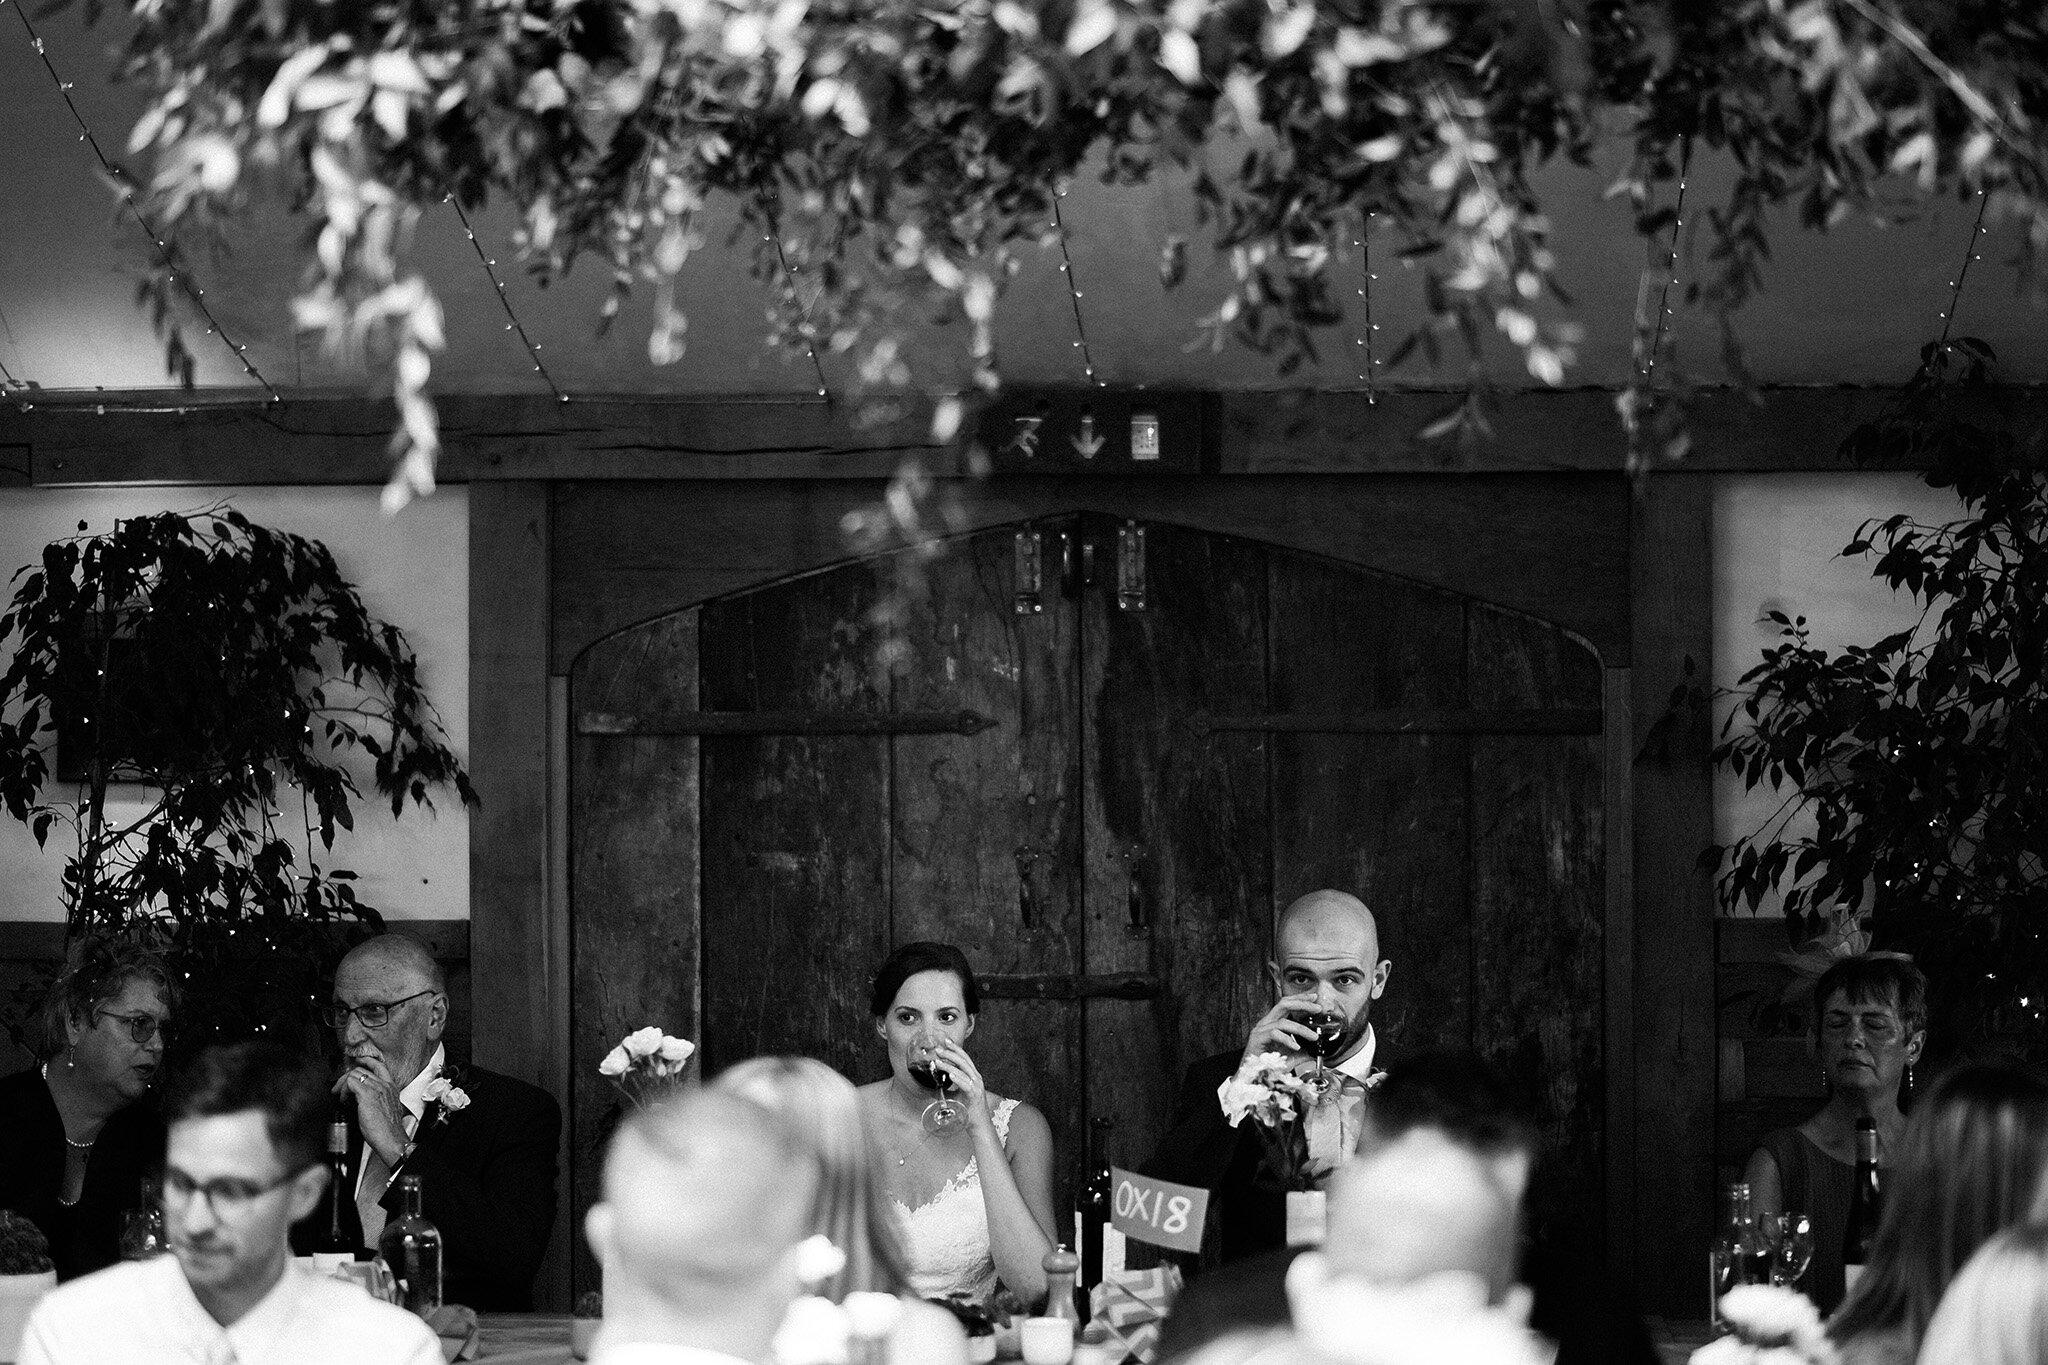 Scott-Stockwell-Photography-wedding-photographer-cripps-barn-red-wine.jpg